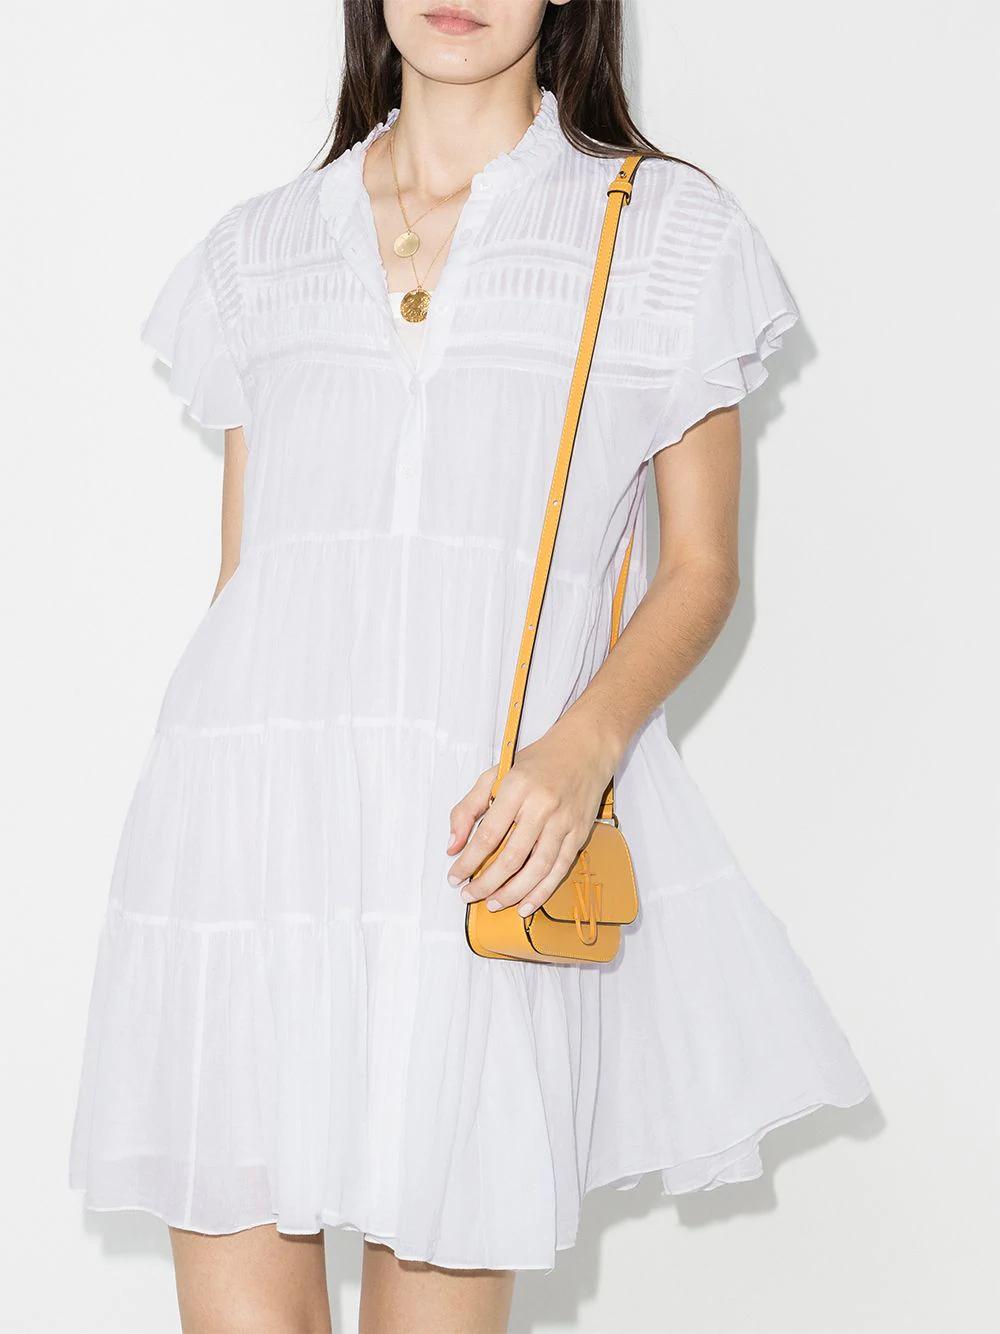 Isabel Marant Etoile Lanikaye Tiered Mini Dress Farfetch Dresses Mini Dress Isabel Marant Etoile [ 1334 x 1000 Pixel ]